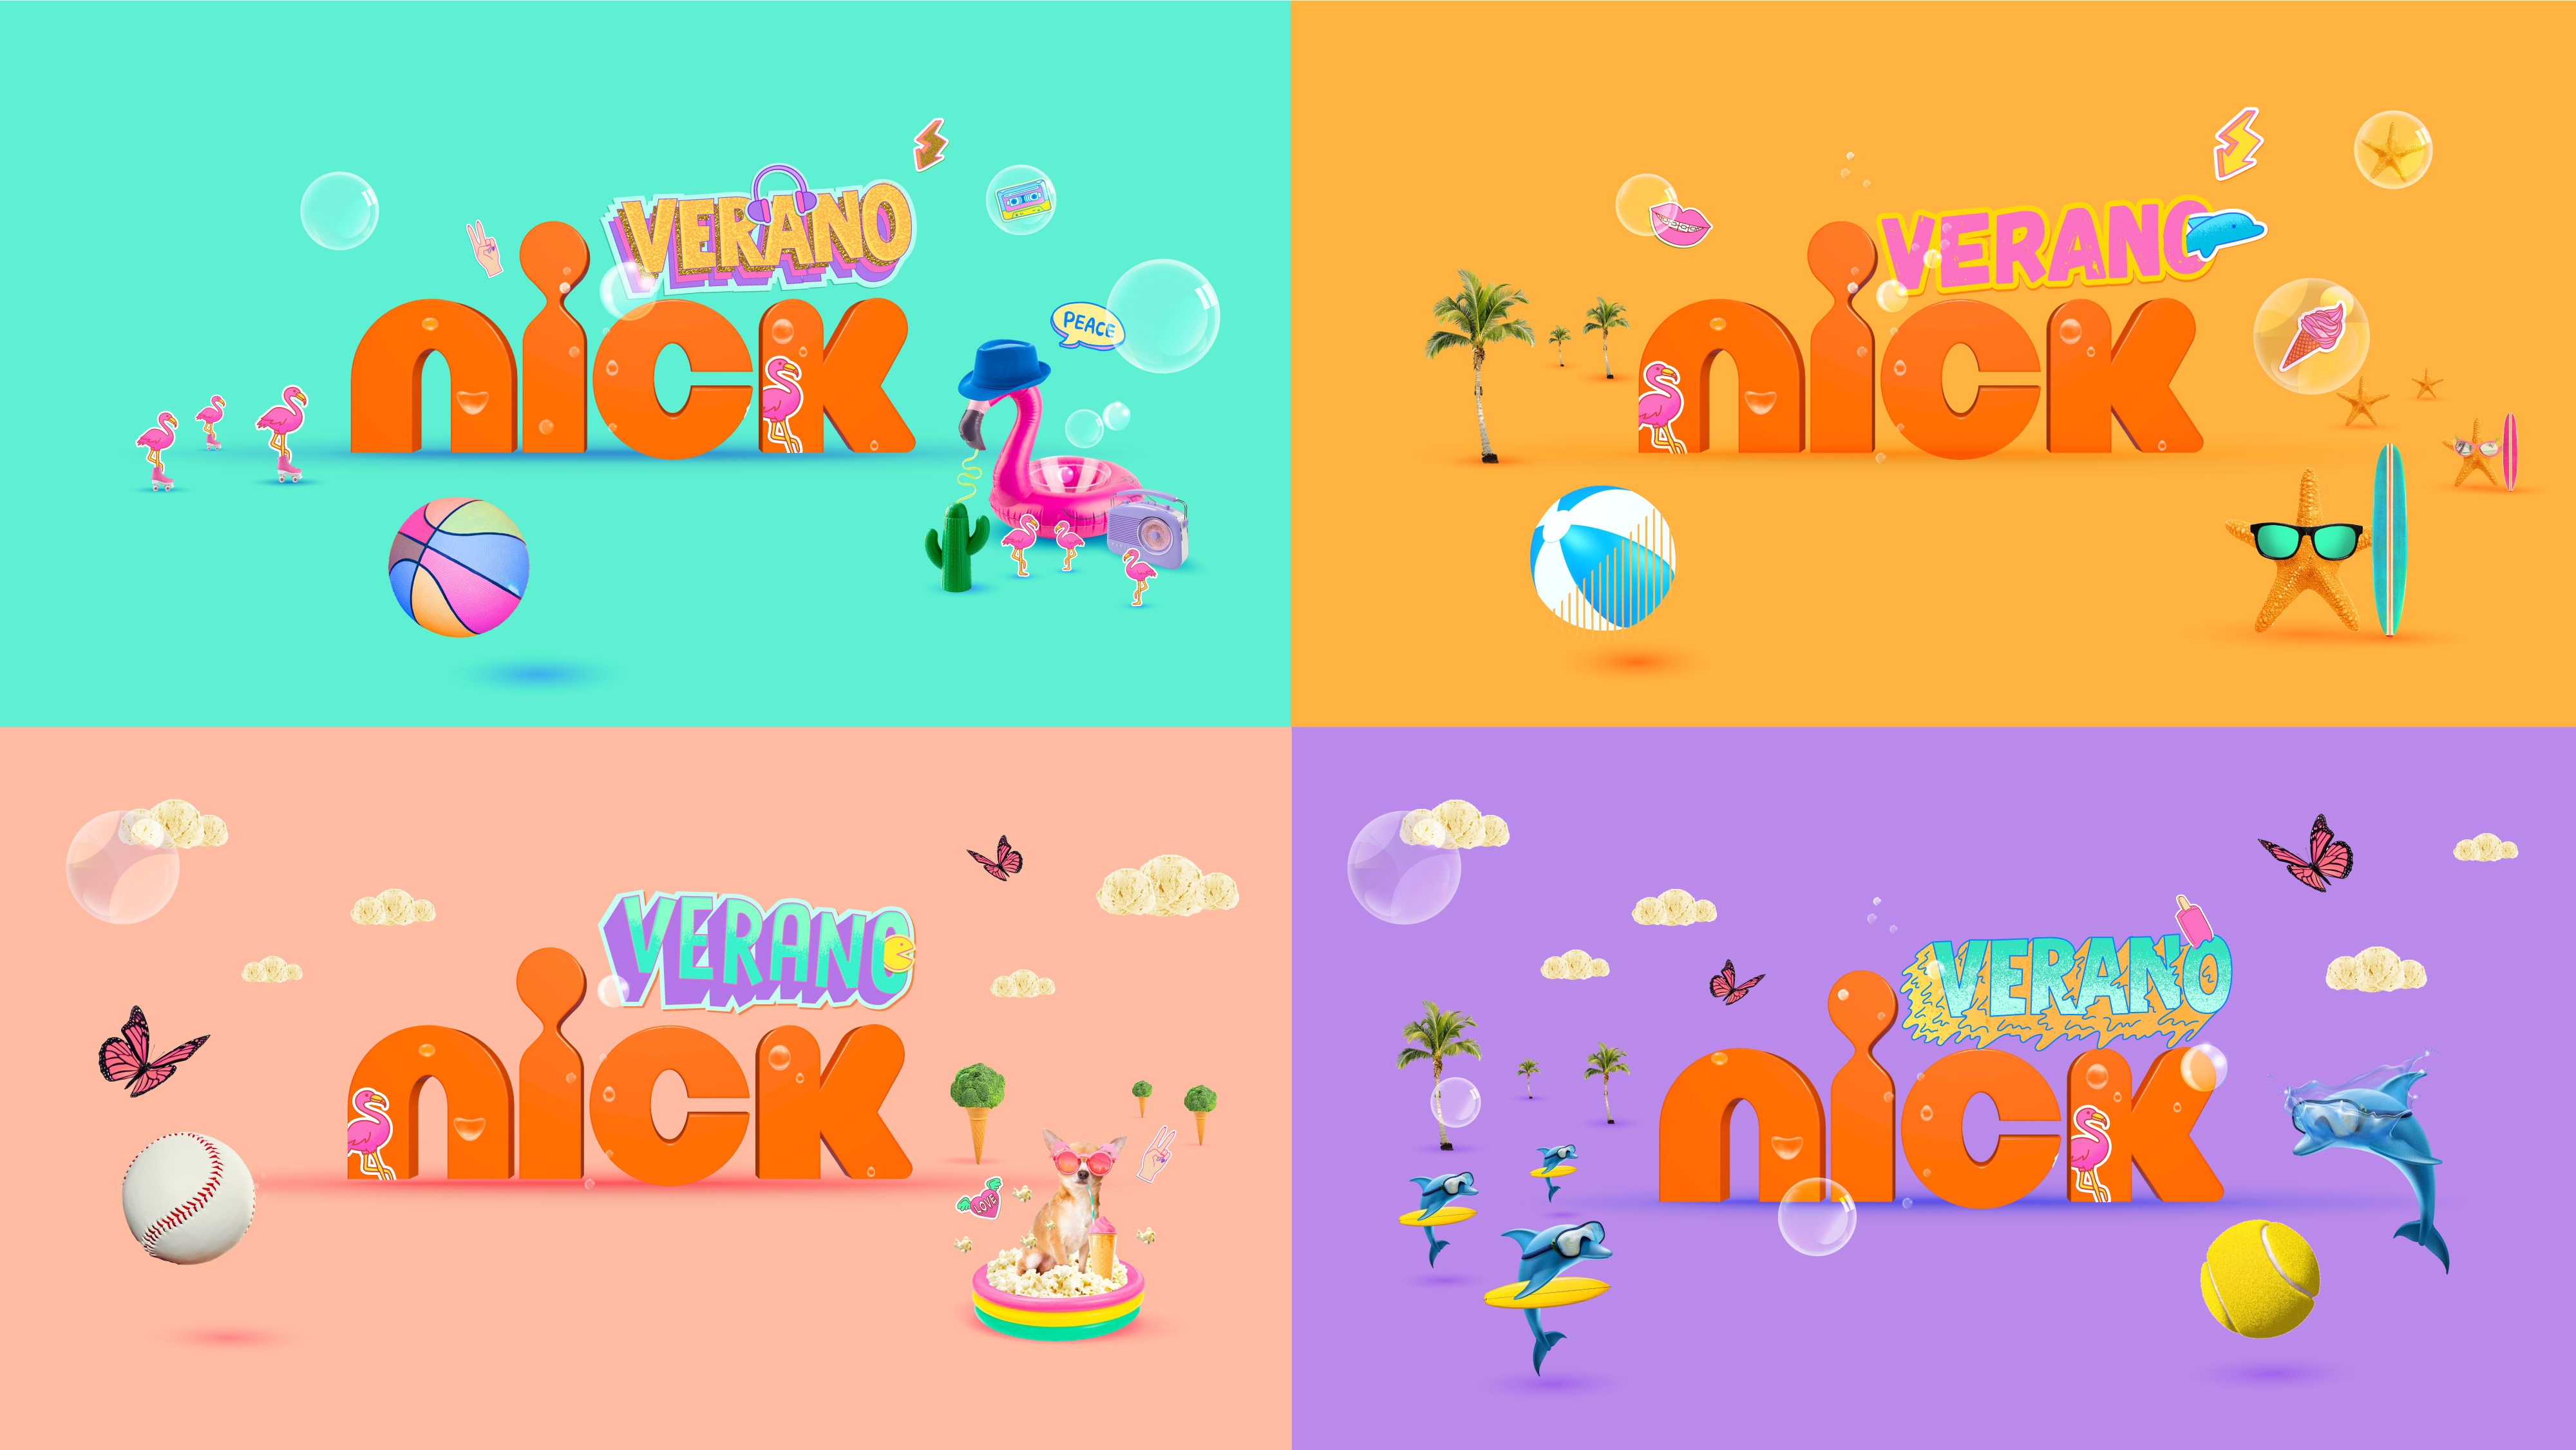 verano_nick_2018-07